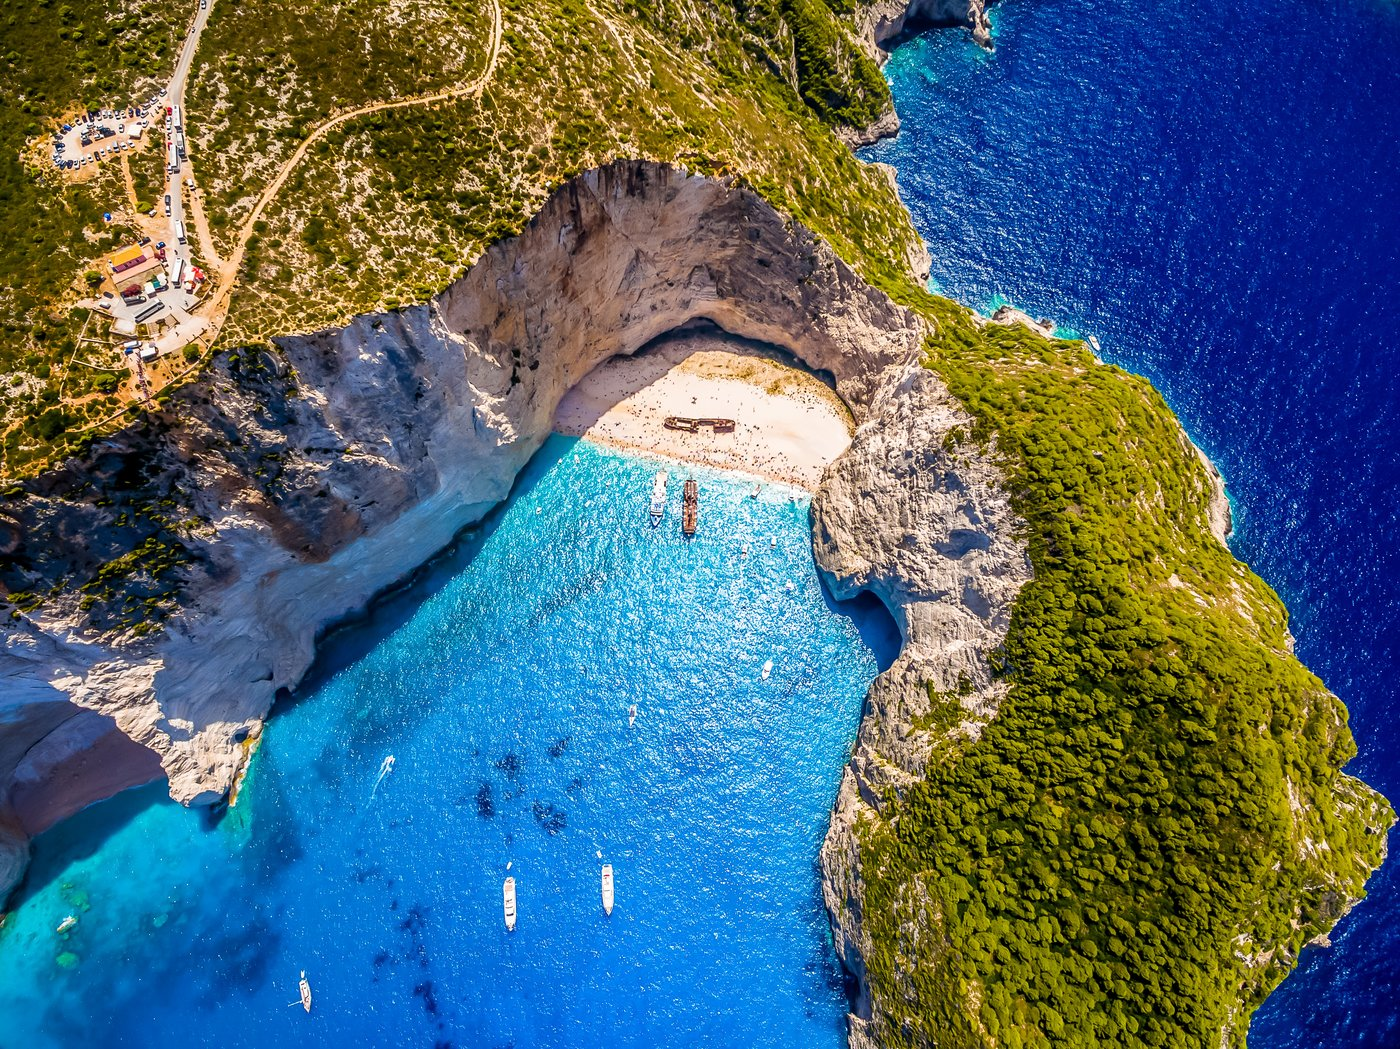 Aerial view of Navagio beach Shipwreck in Zakynthos (Zante) island, in Greece